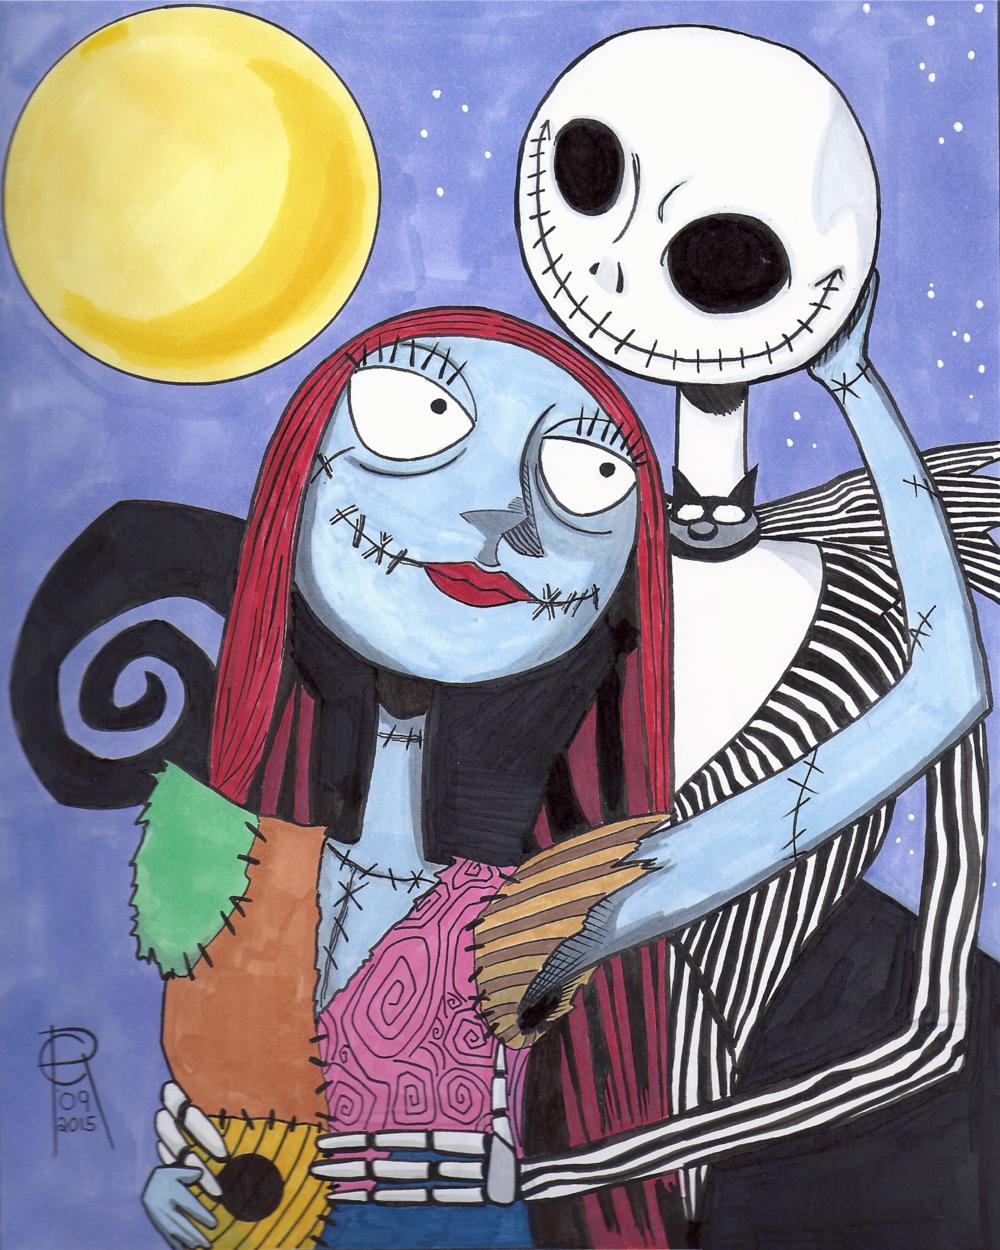 Jack and Sally (Nightmare Before Christmas) — The Art of Mental Pablum